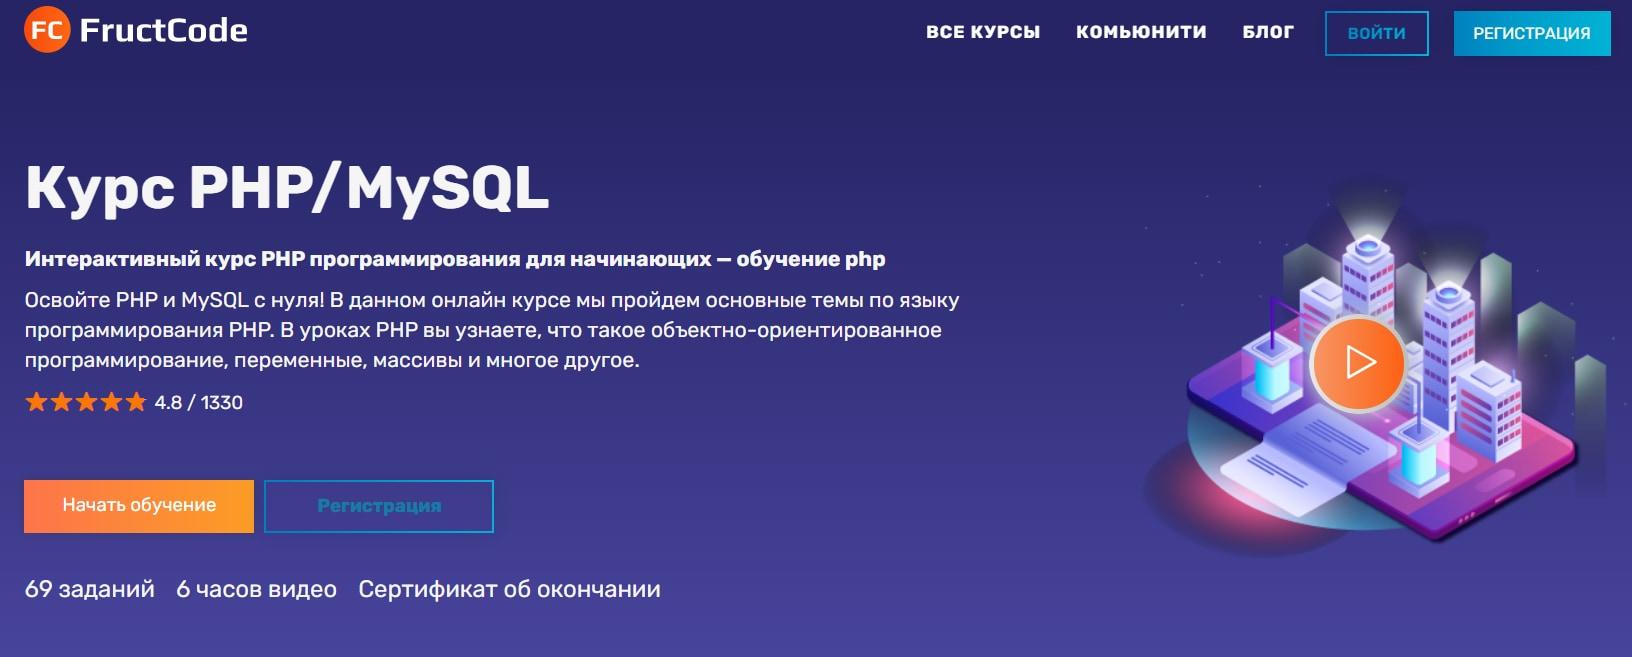 Записаться на Курс «PHP/MySQL» от FructCode